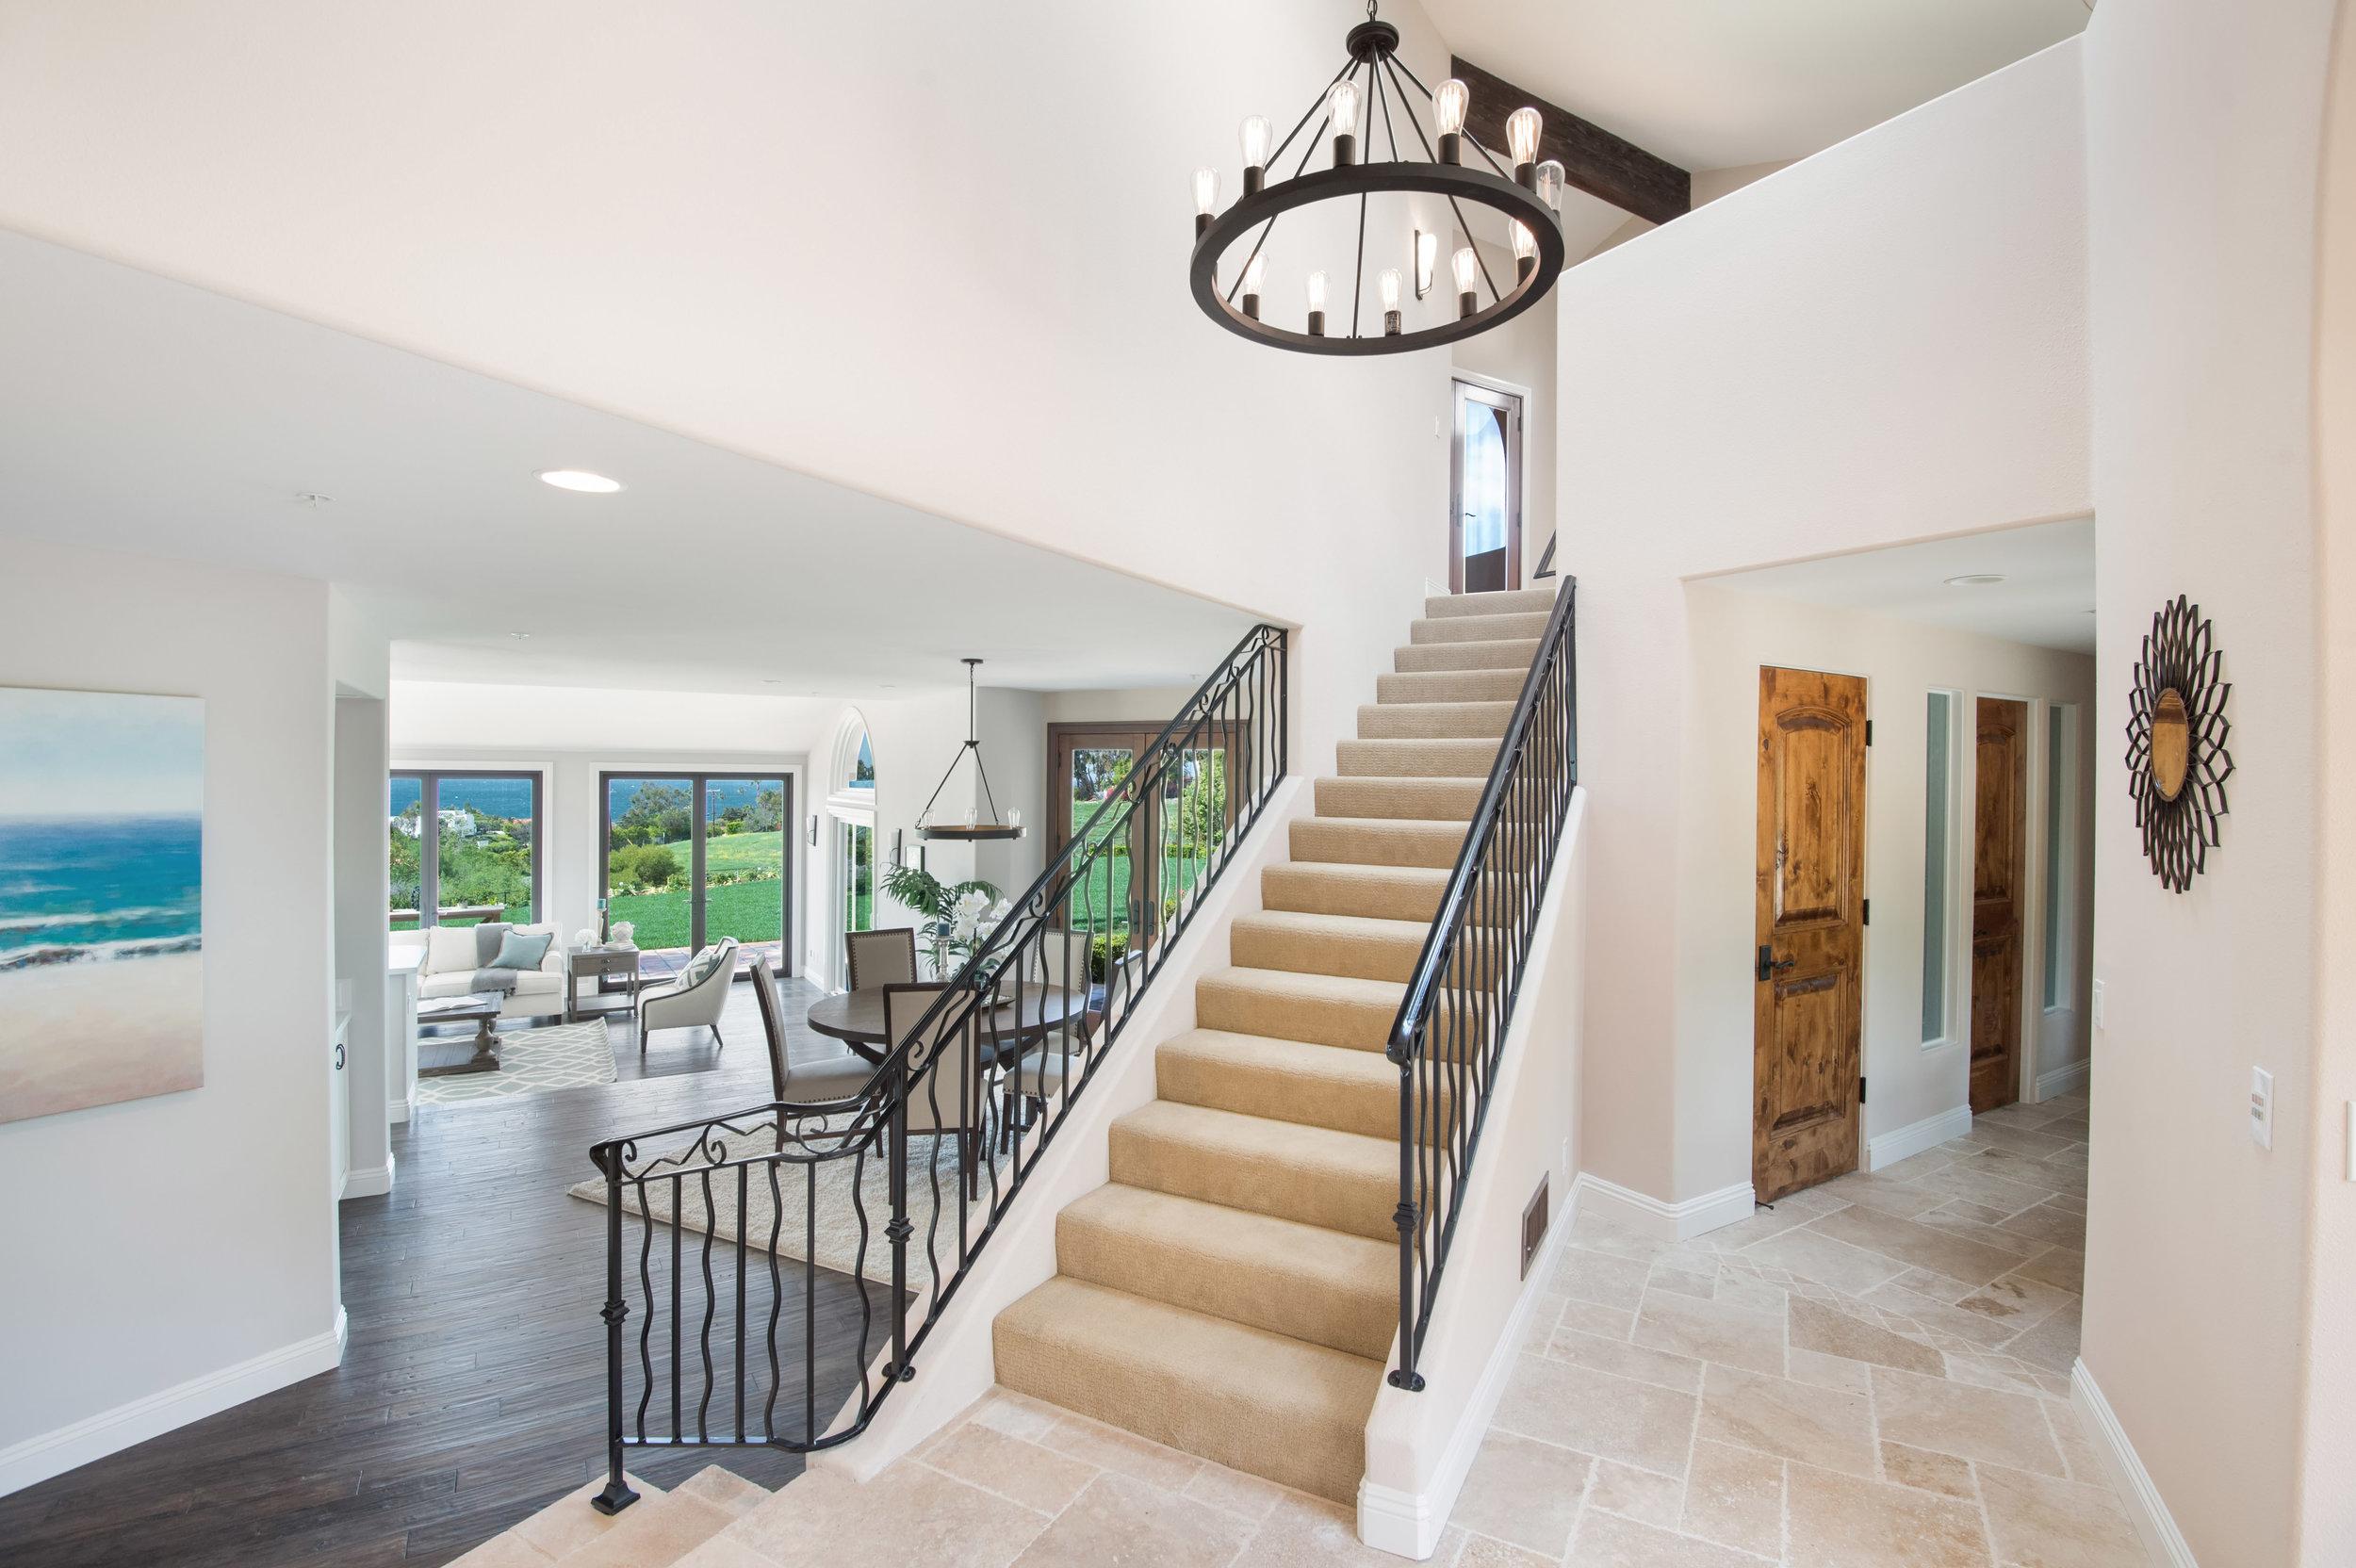 009 6130 Via Cabrillo For Sale Lease The Malibu Life Team Luxury Real Estate.jpg